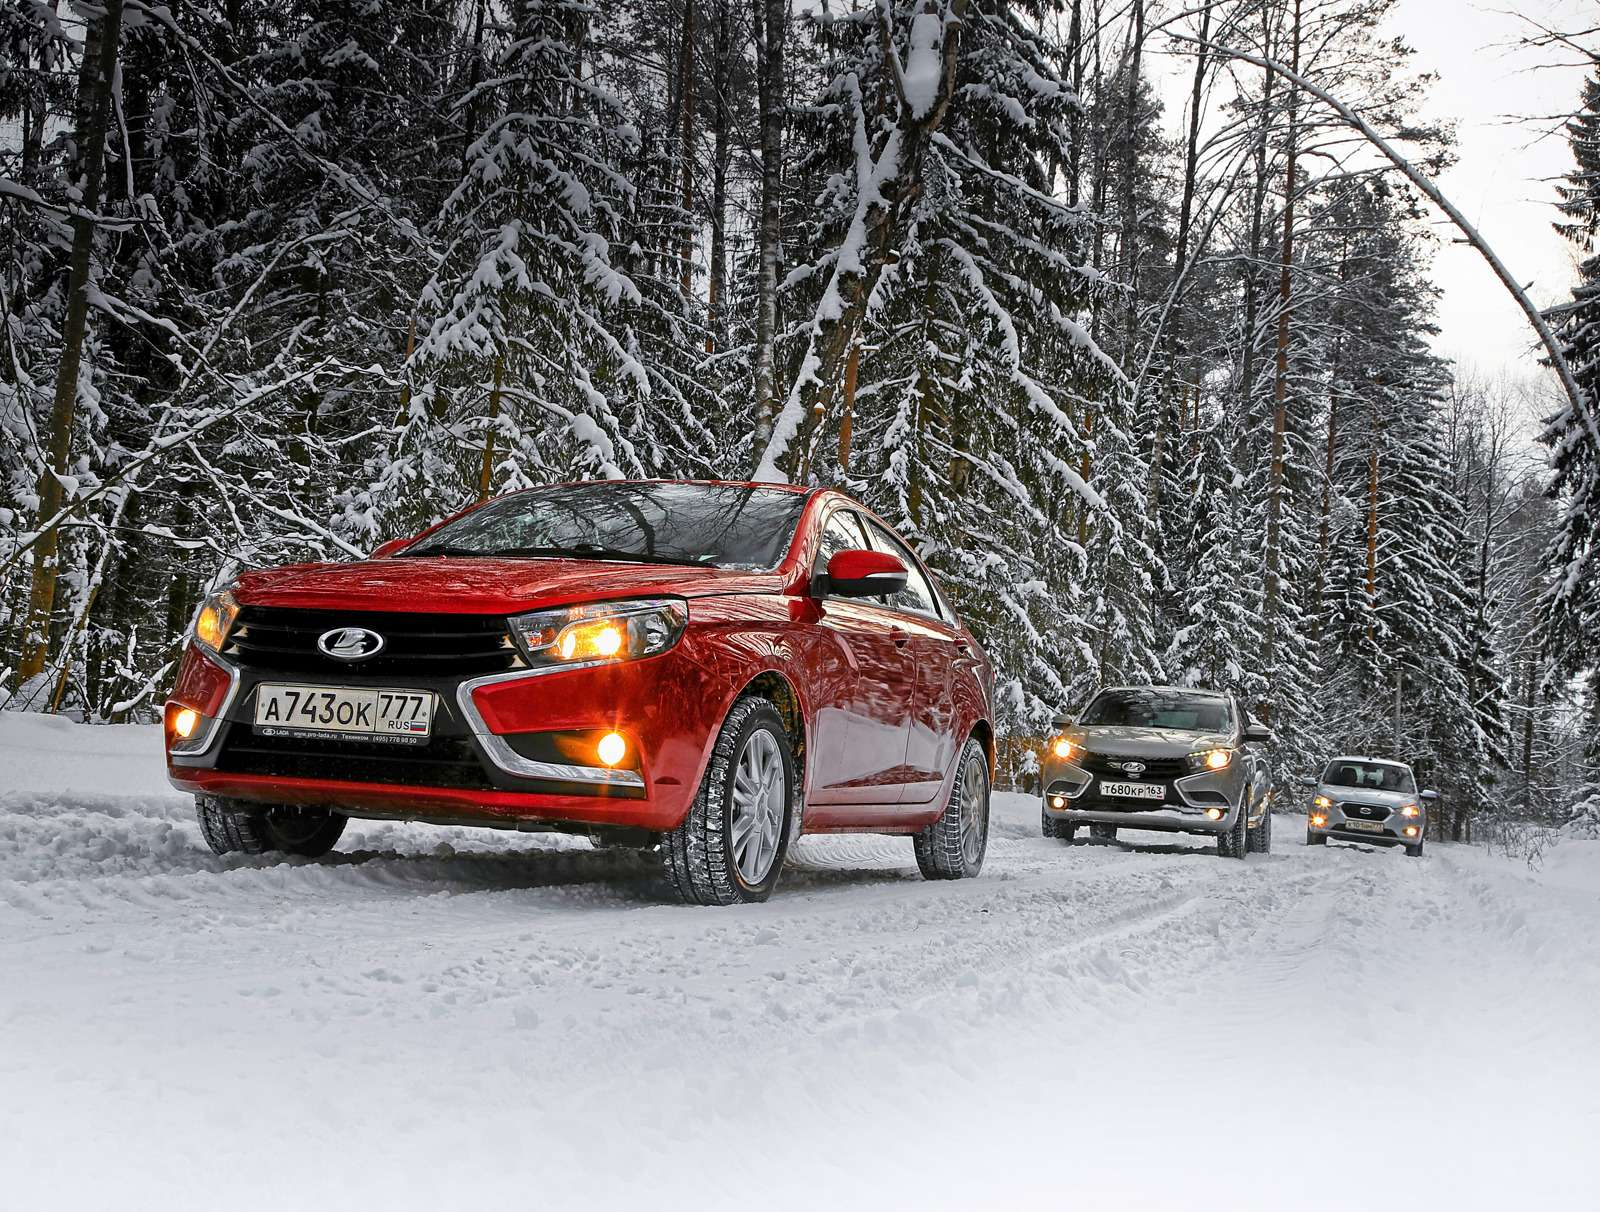 Большой зимний тест: Lada Vesta, Lada XRAY иDatsun mi-DO изпарка ЗР— фото 571416